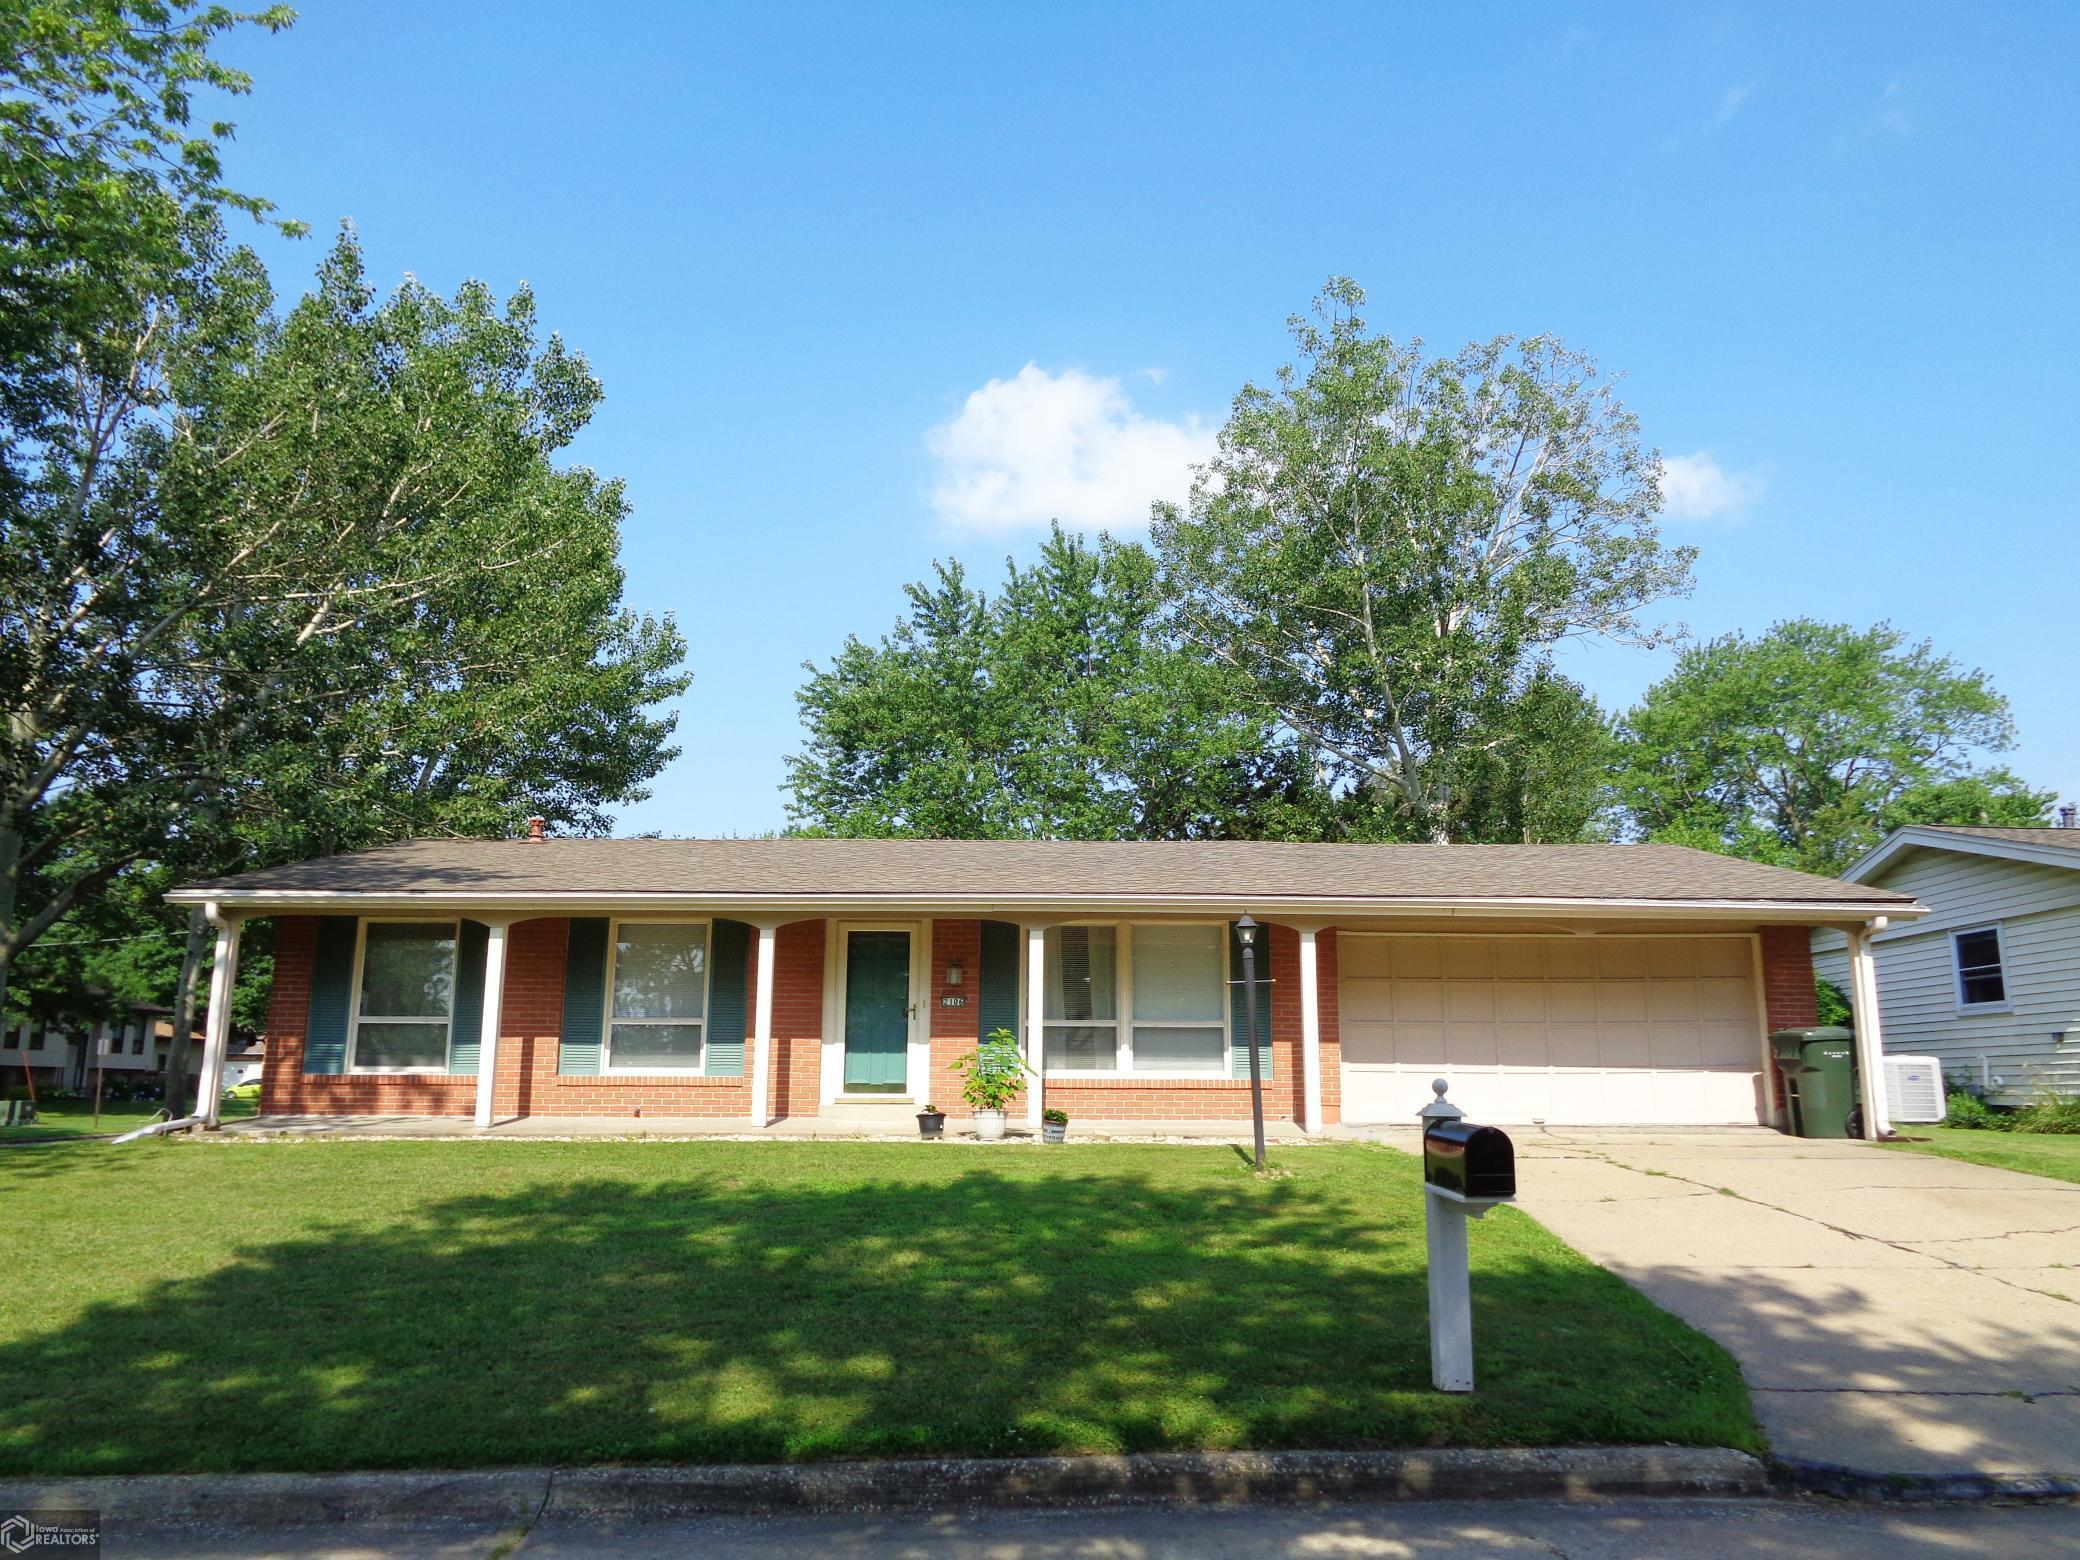 2106 logan drive Property Photo - Keokuk, IA real estate listing